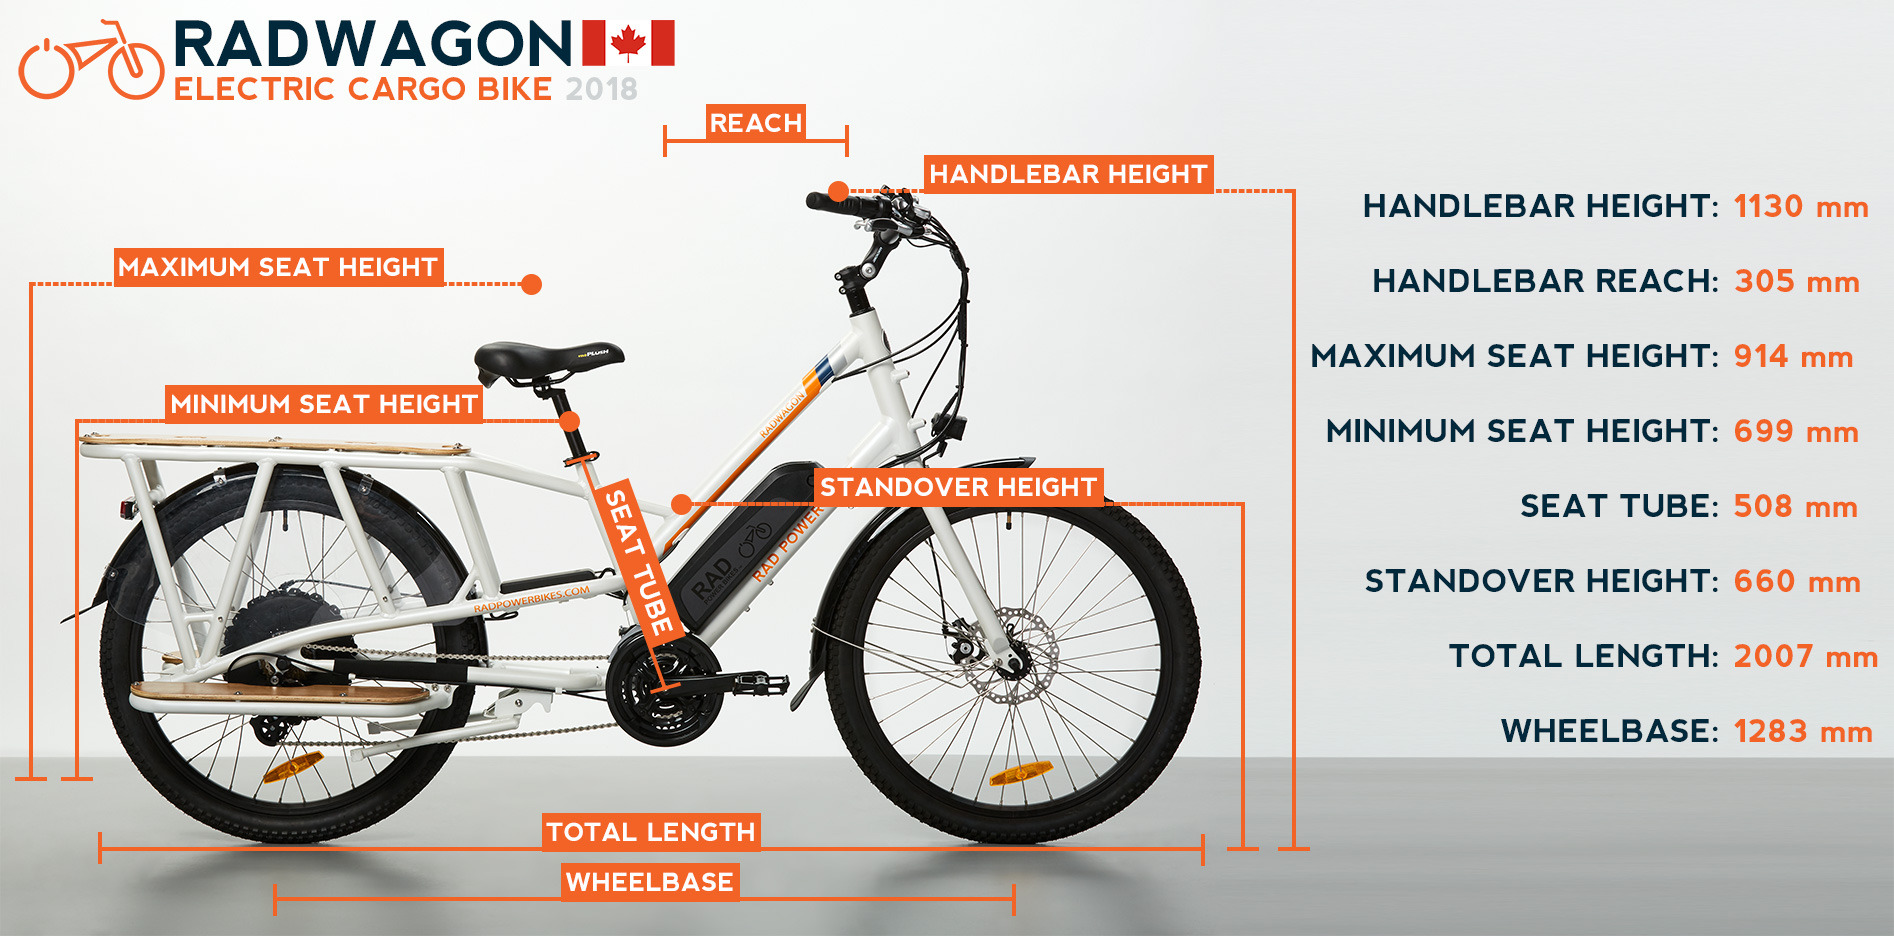 2018 radwagon electric cargo bike rad power bikes canada. Black Bedroom Furniture Sets. Home Design Ideas